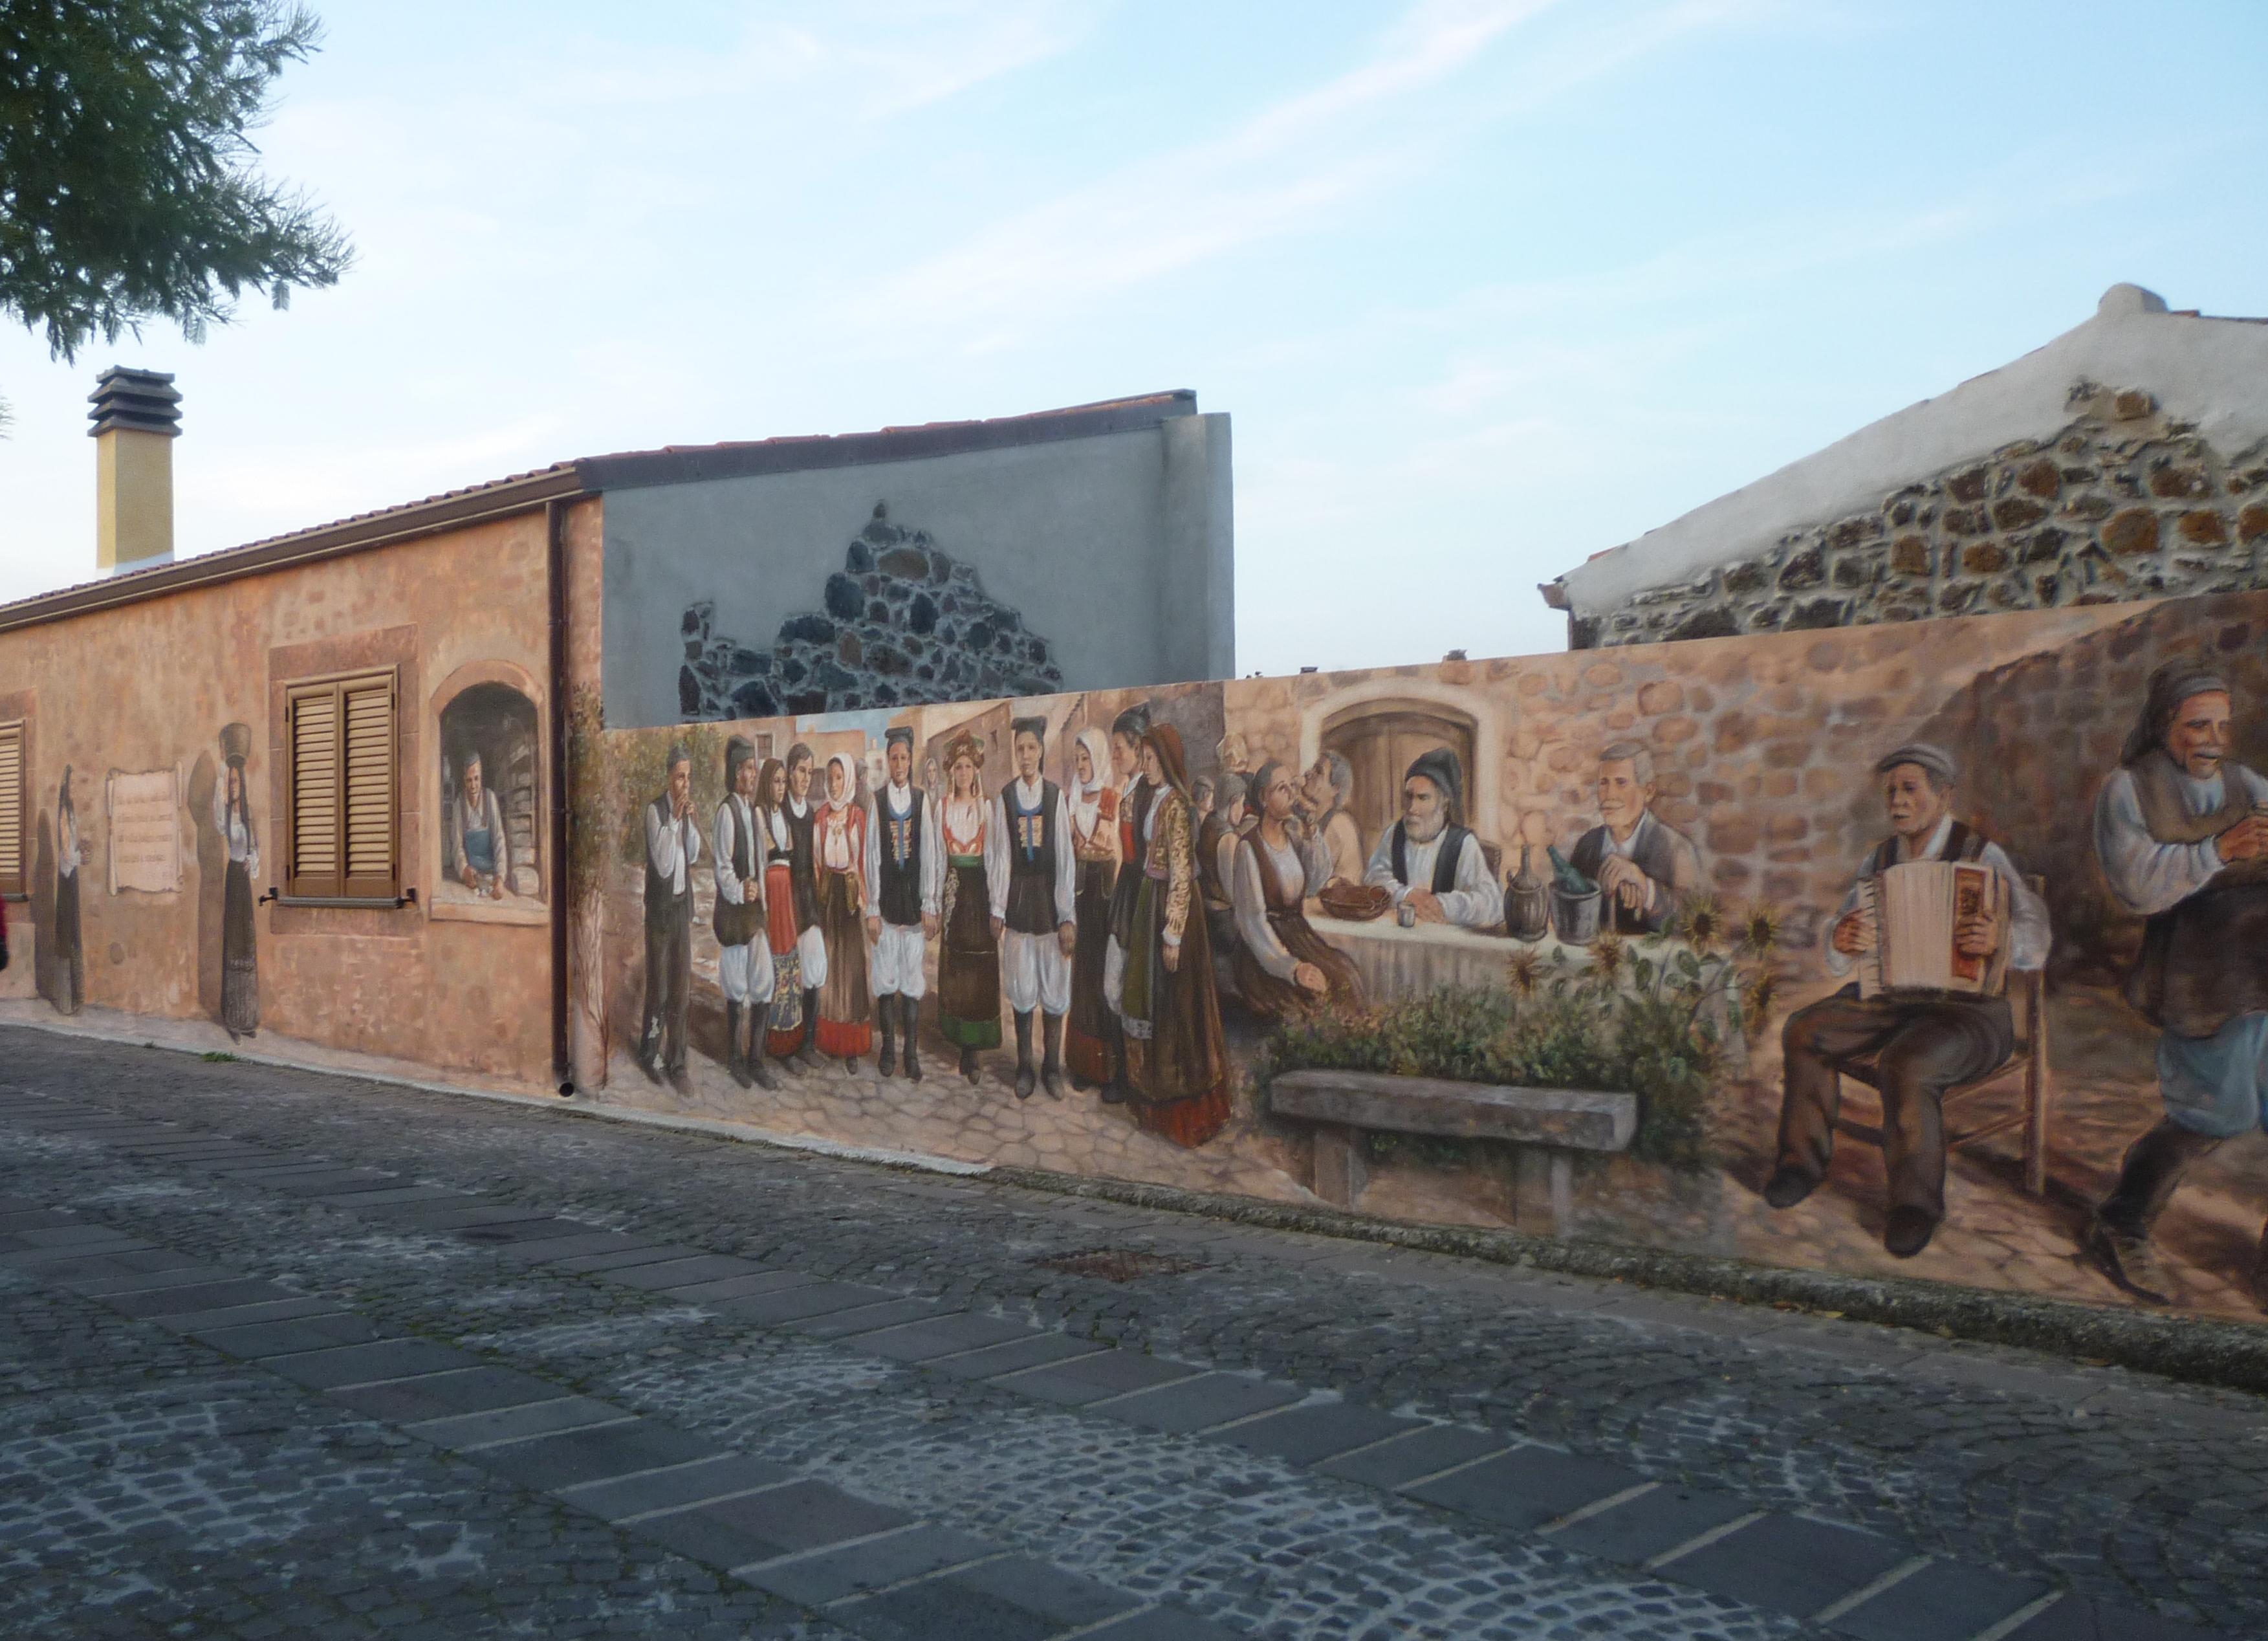 File:Tinnura murales 1.jpg - Wikipedia